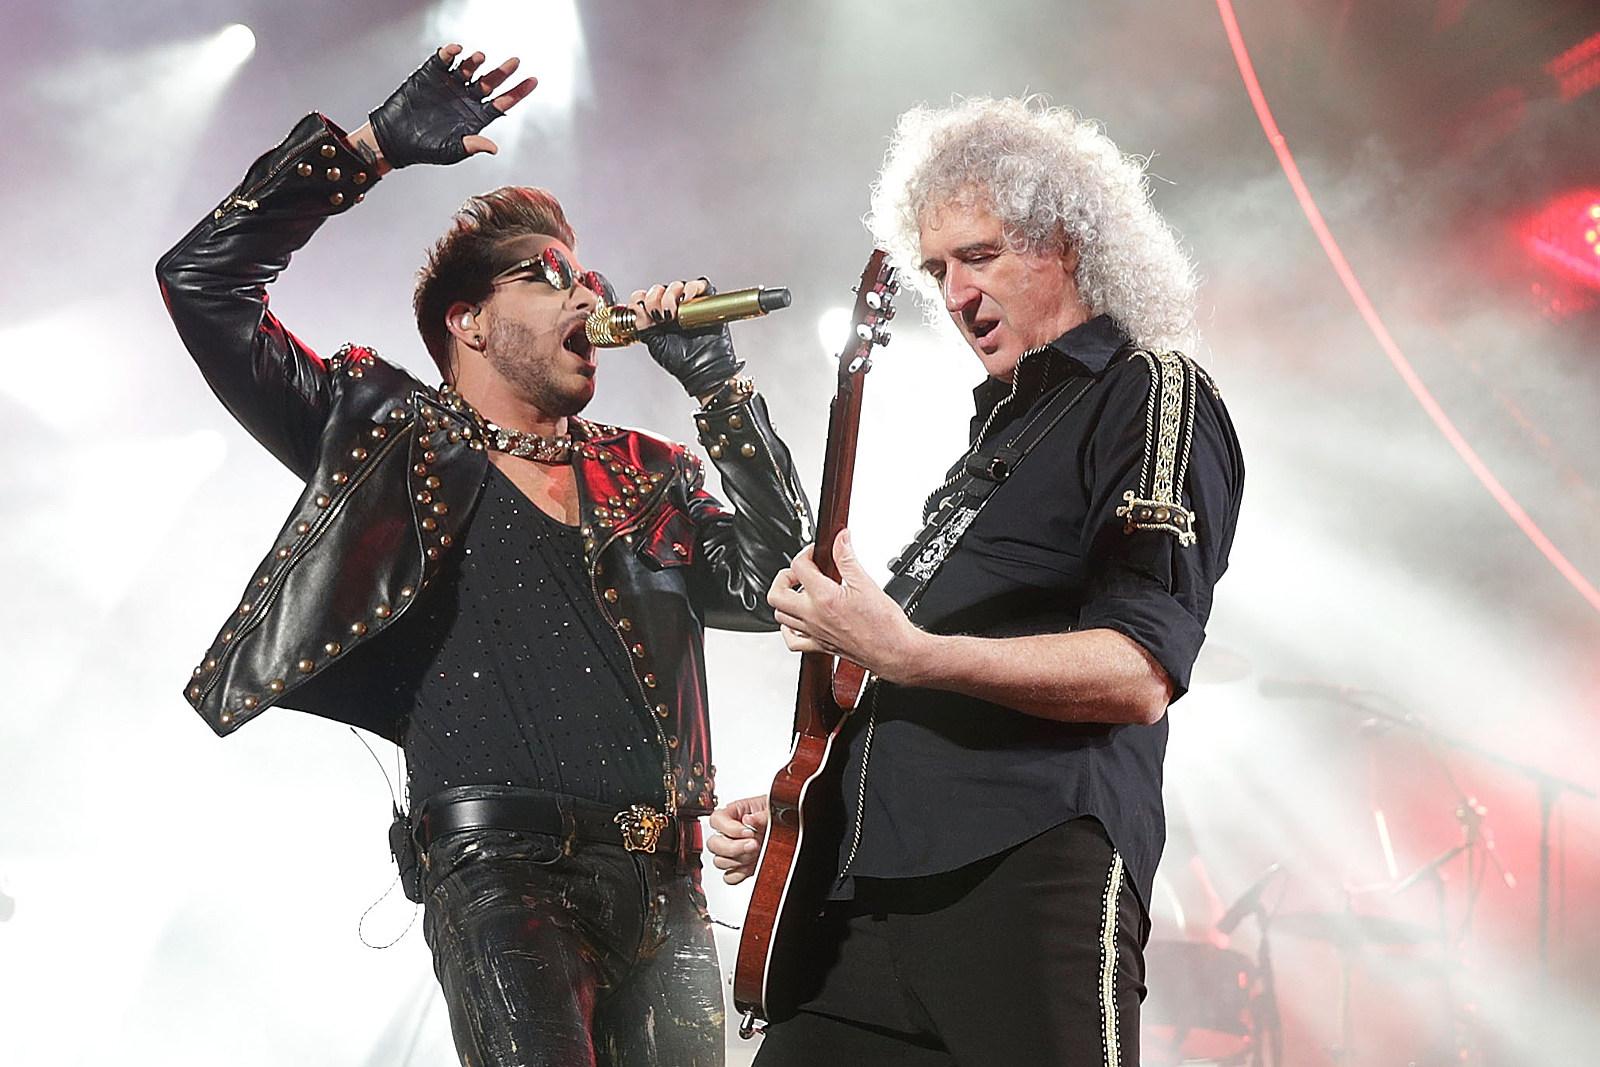 Adam Lambert Says 'Bohemian Rhapsody' Sequel 'Doesn't Make Sense'